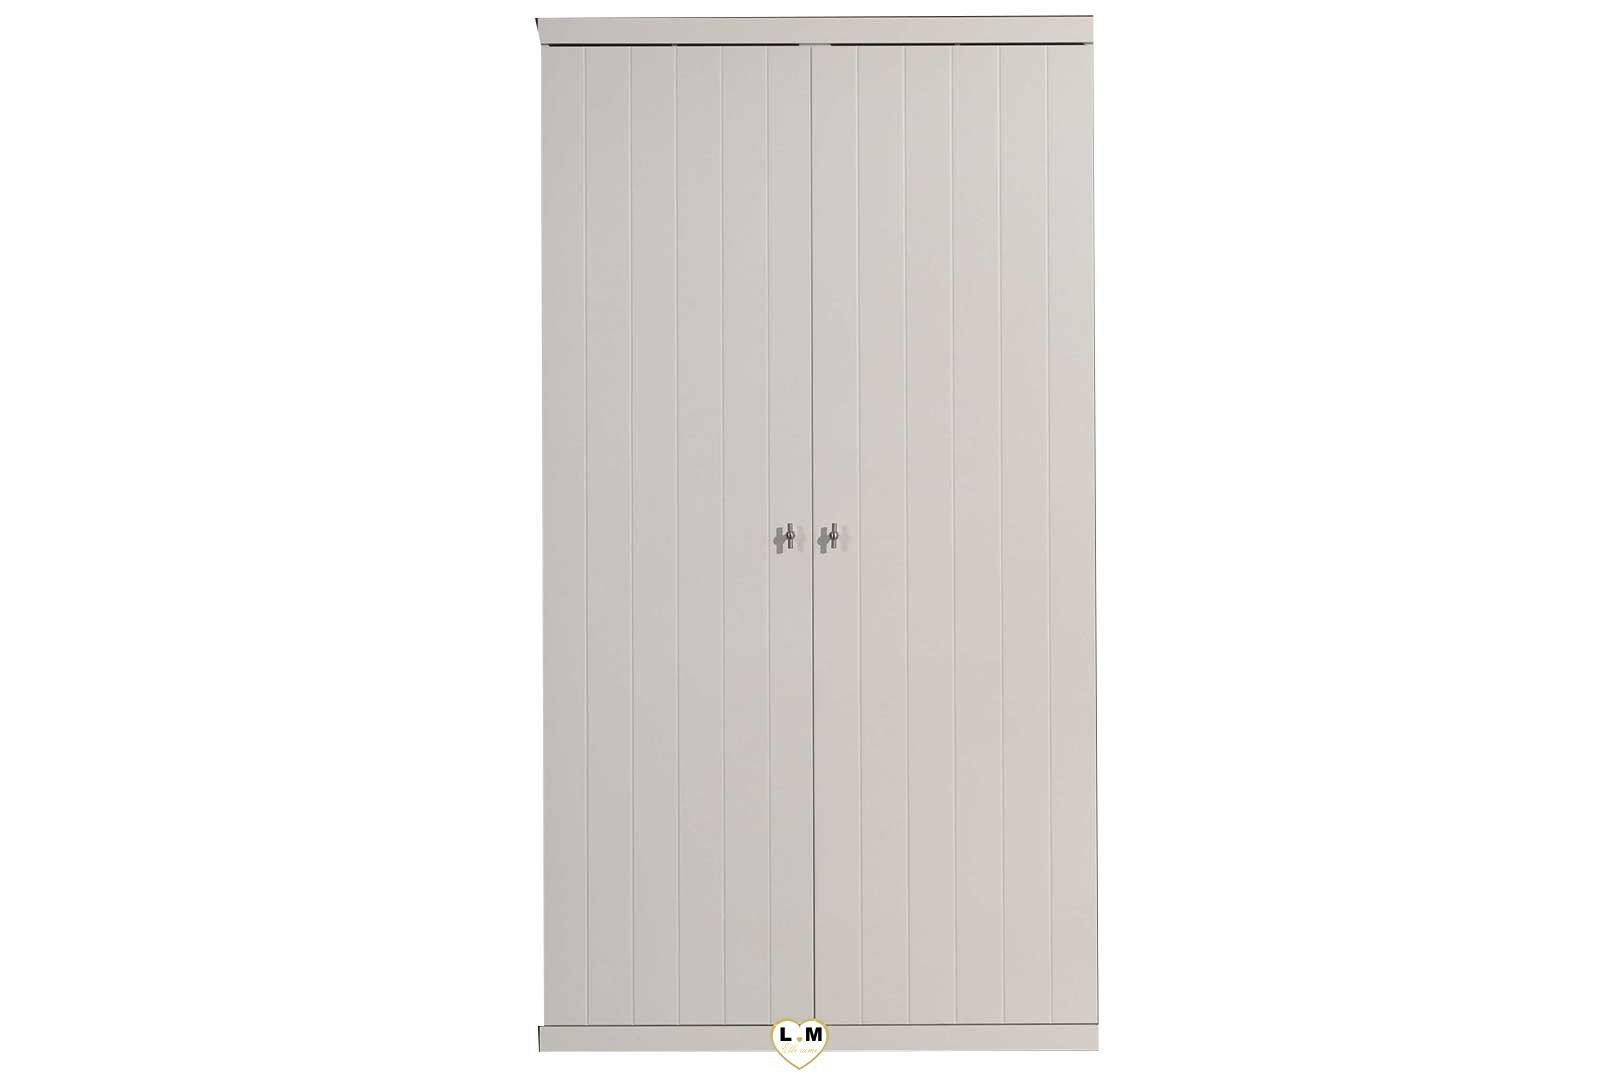 robinson chambre ado l 39 armoire 2 portes lignemeuble com. Black Bedroom Furniture Sets. Home Design Ideas